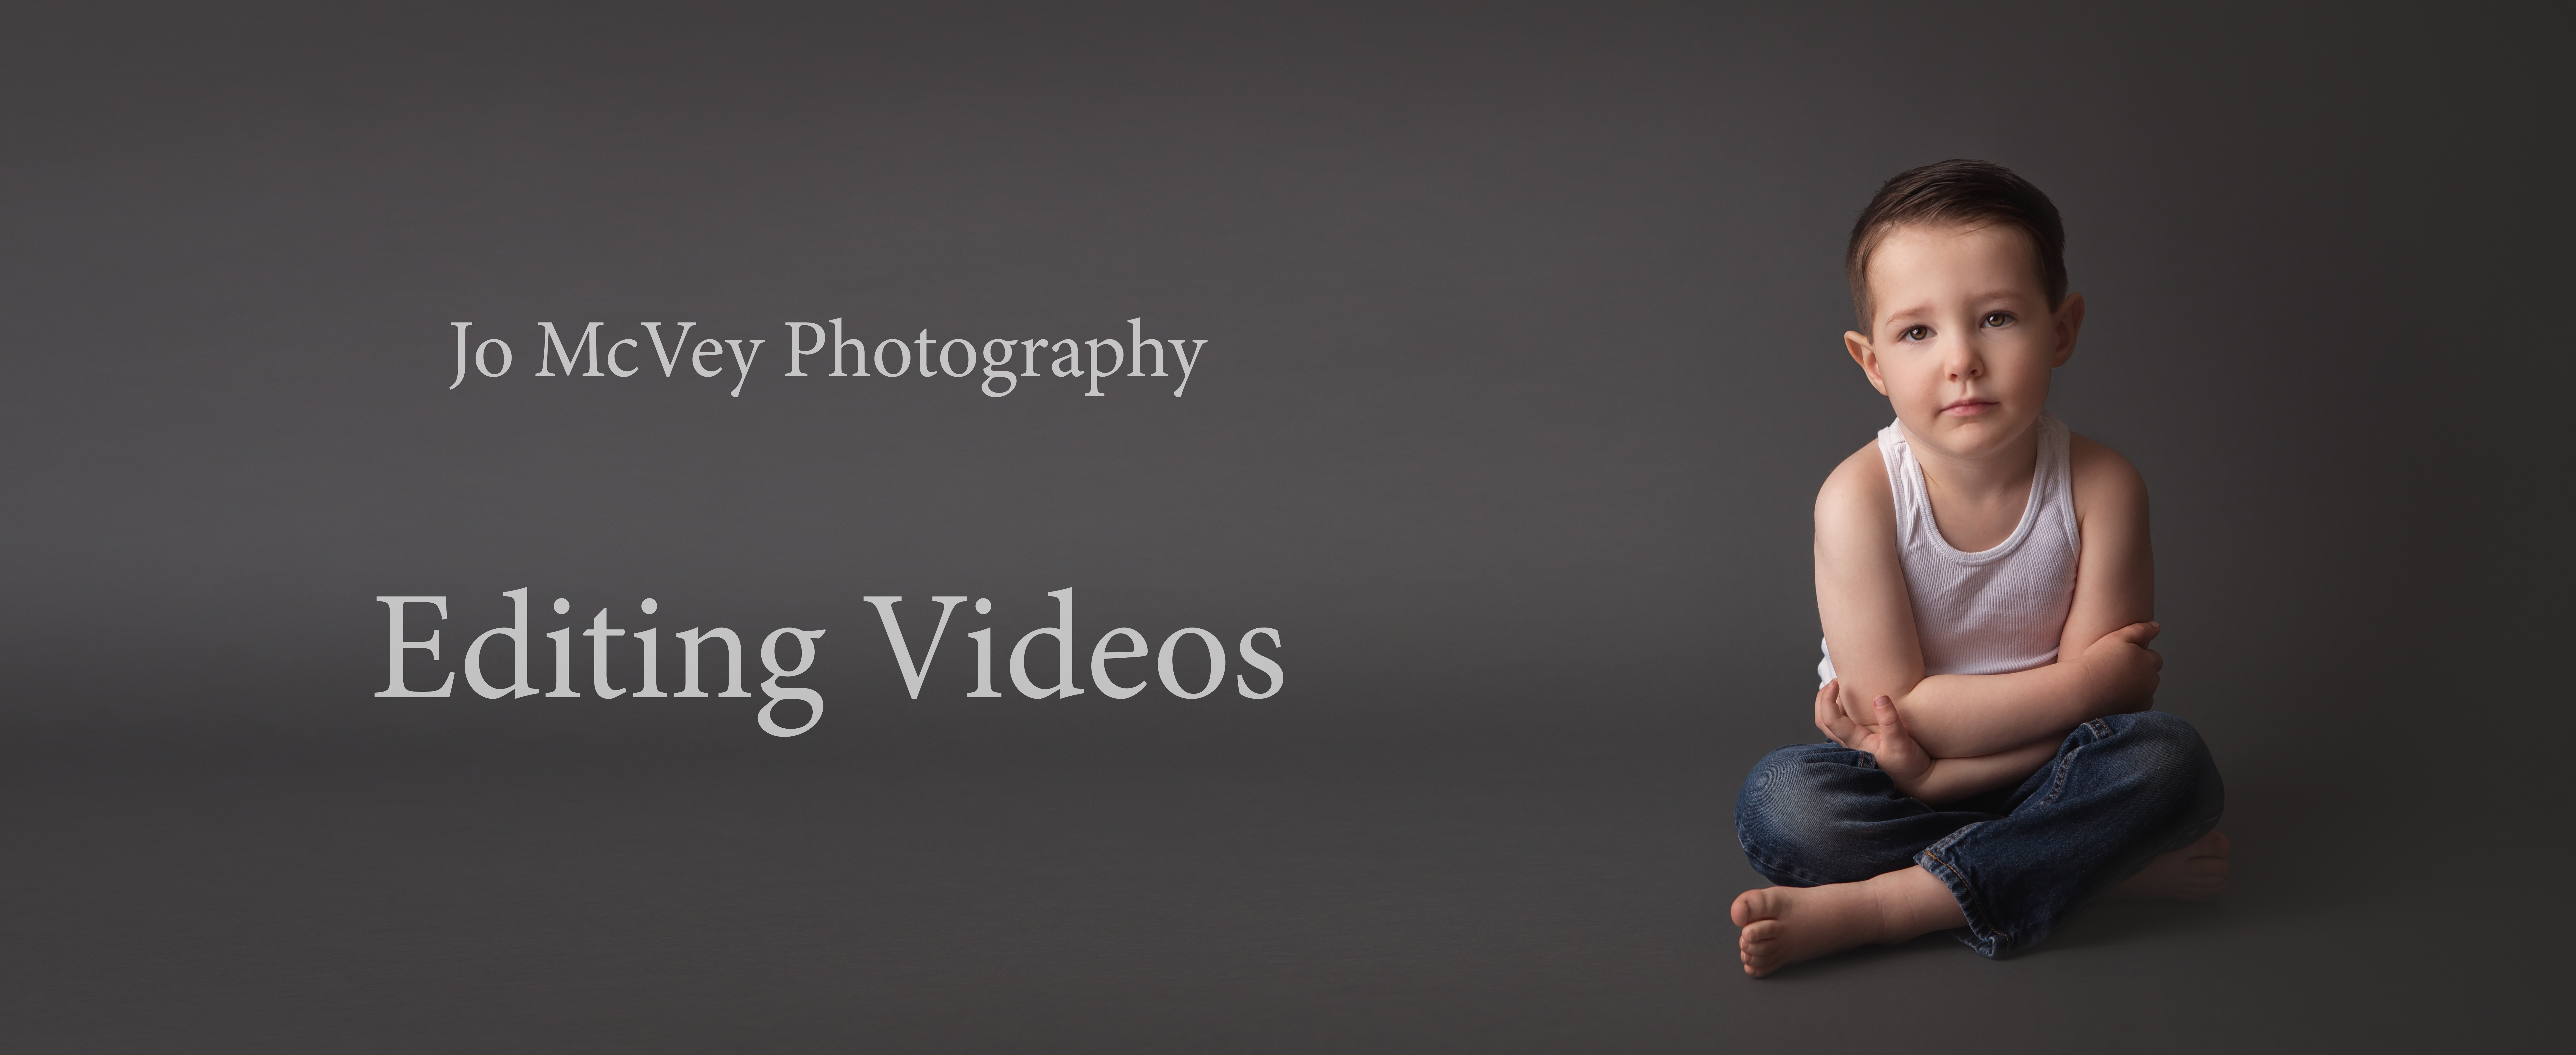 Editing Videos by Jo McVey Photography